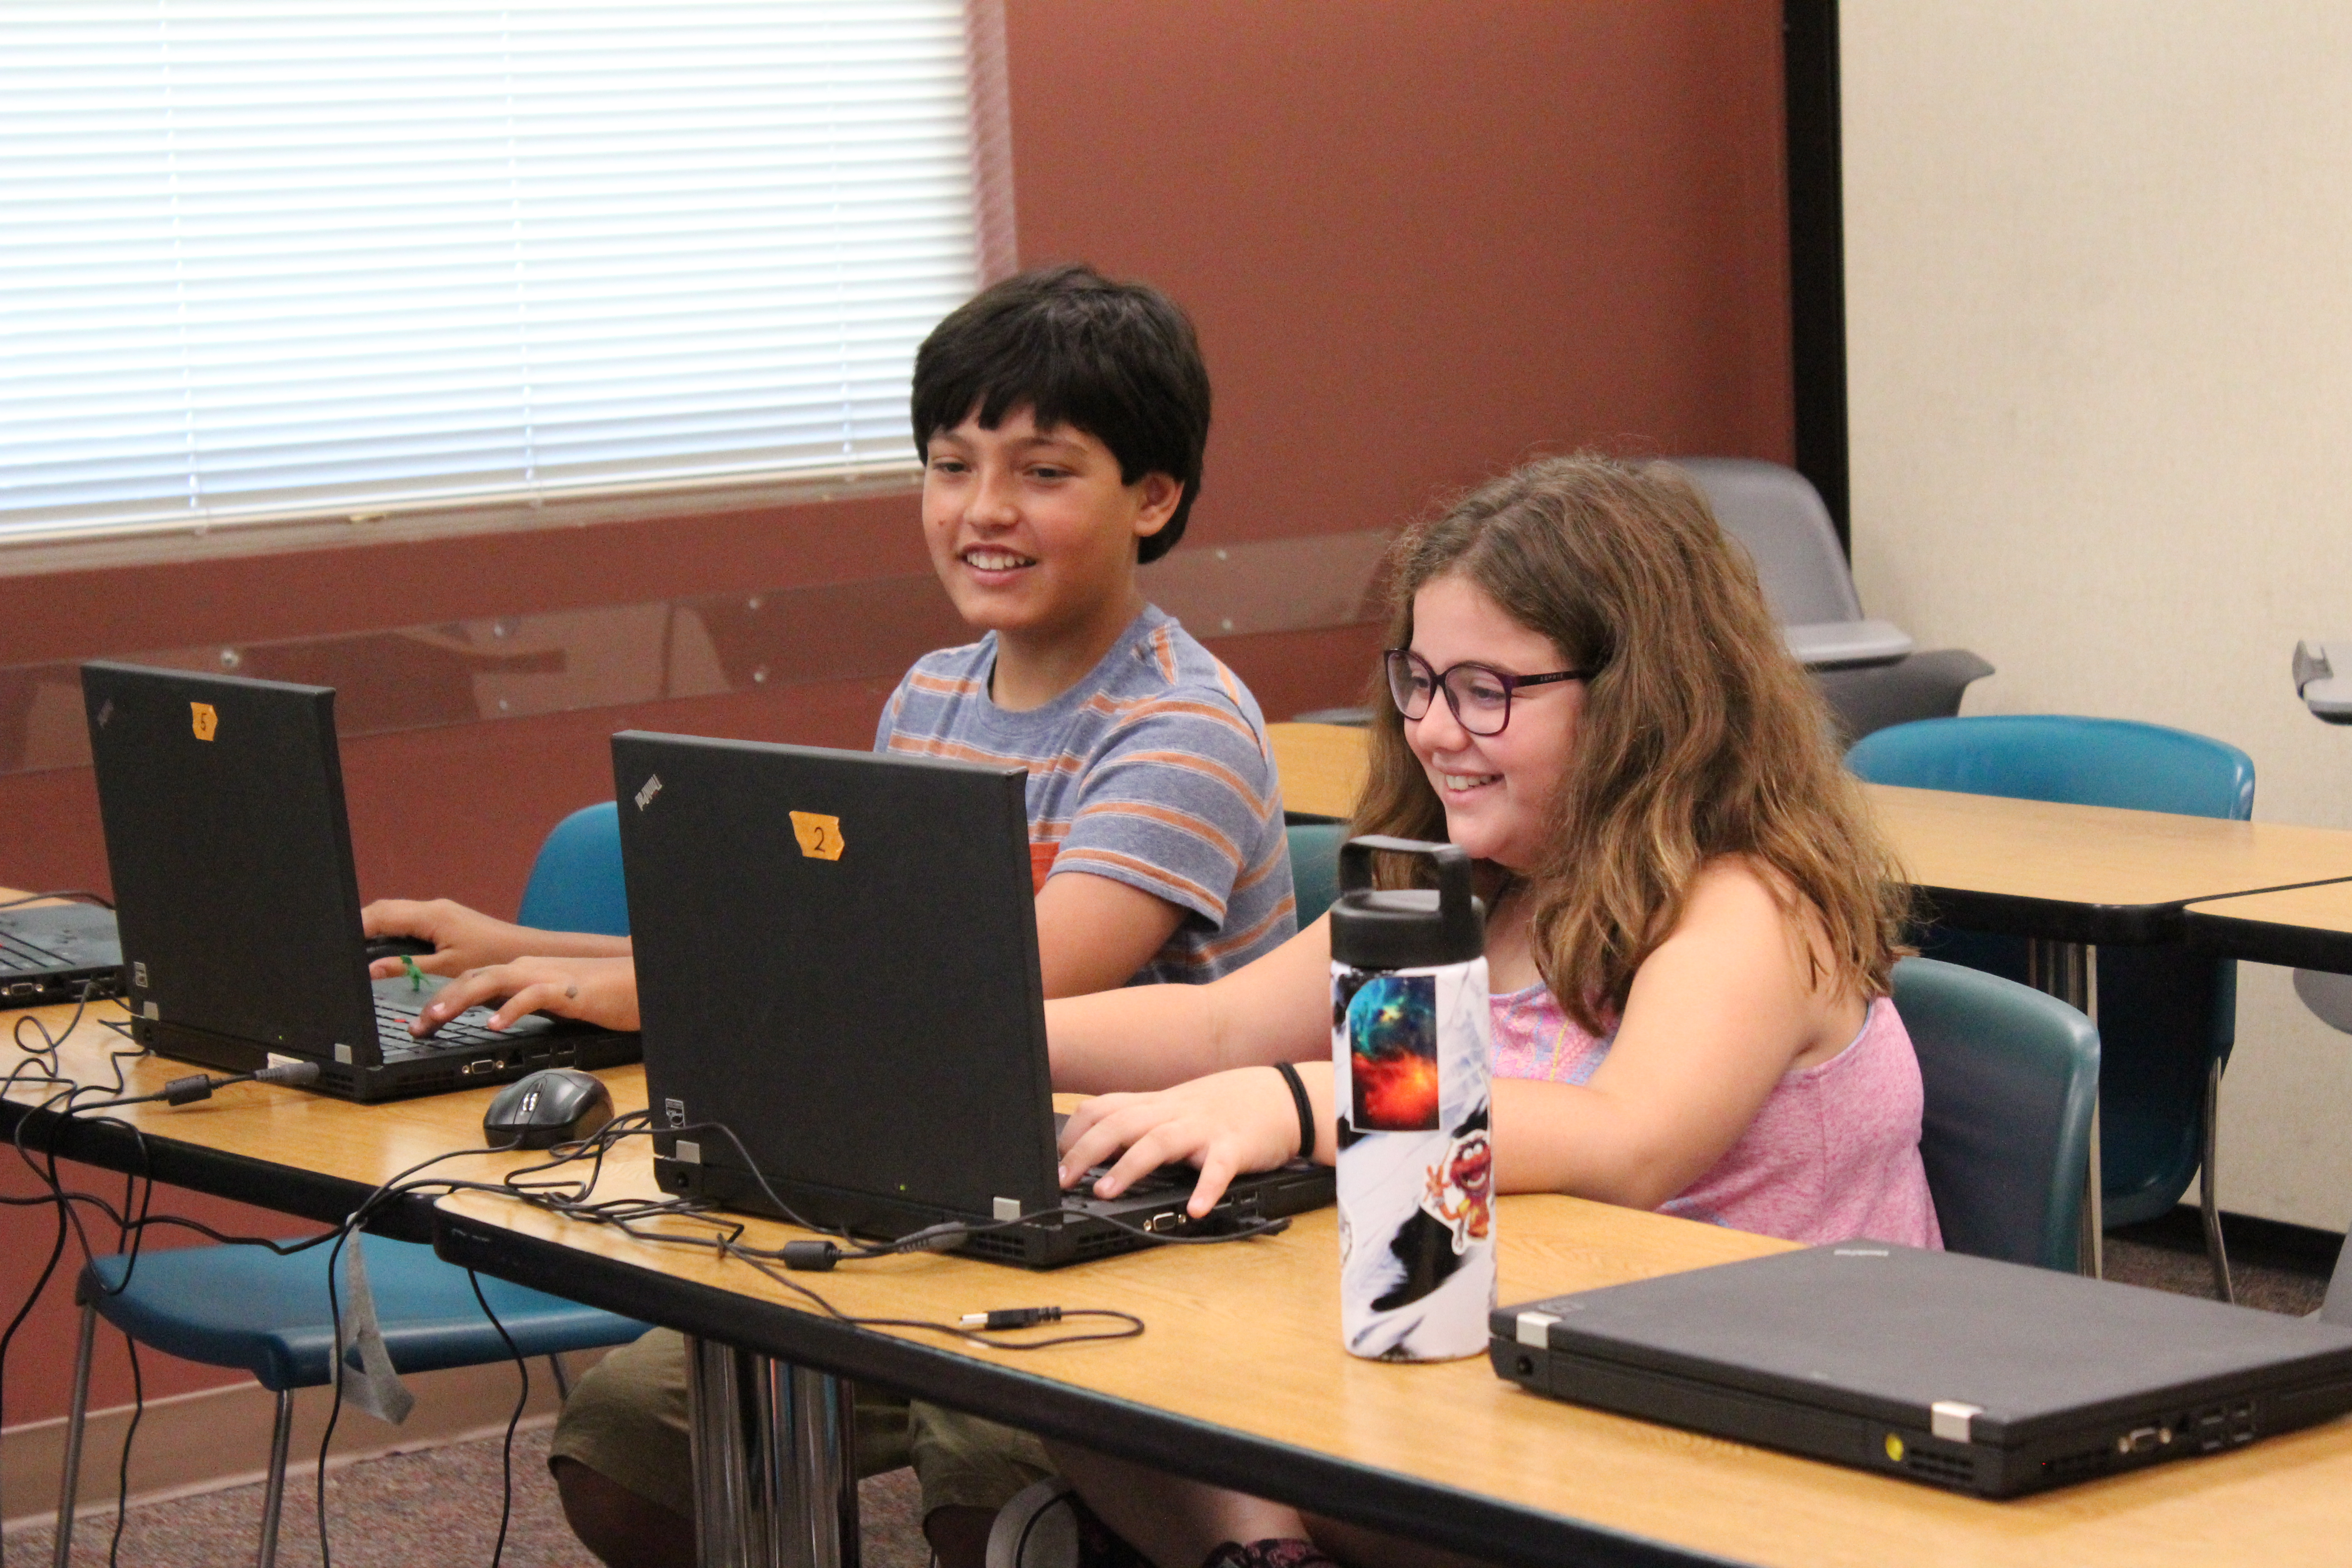 Summer Program - Robotics | URJ 6 Points Sci-Tech Academy West